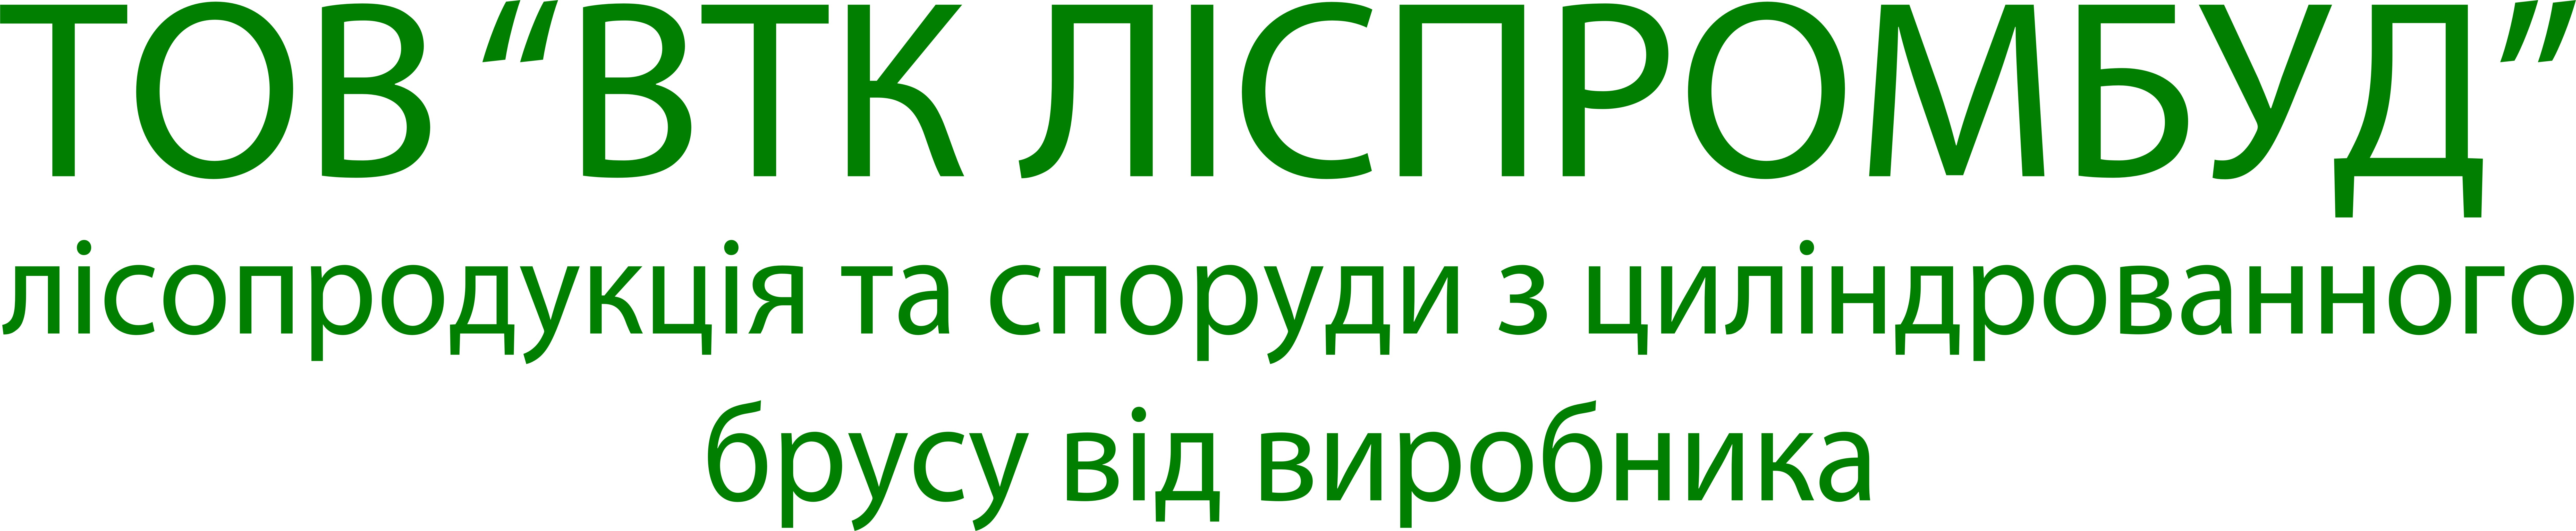 Леспромбуд, ООО